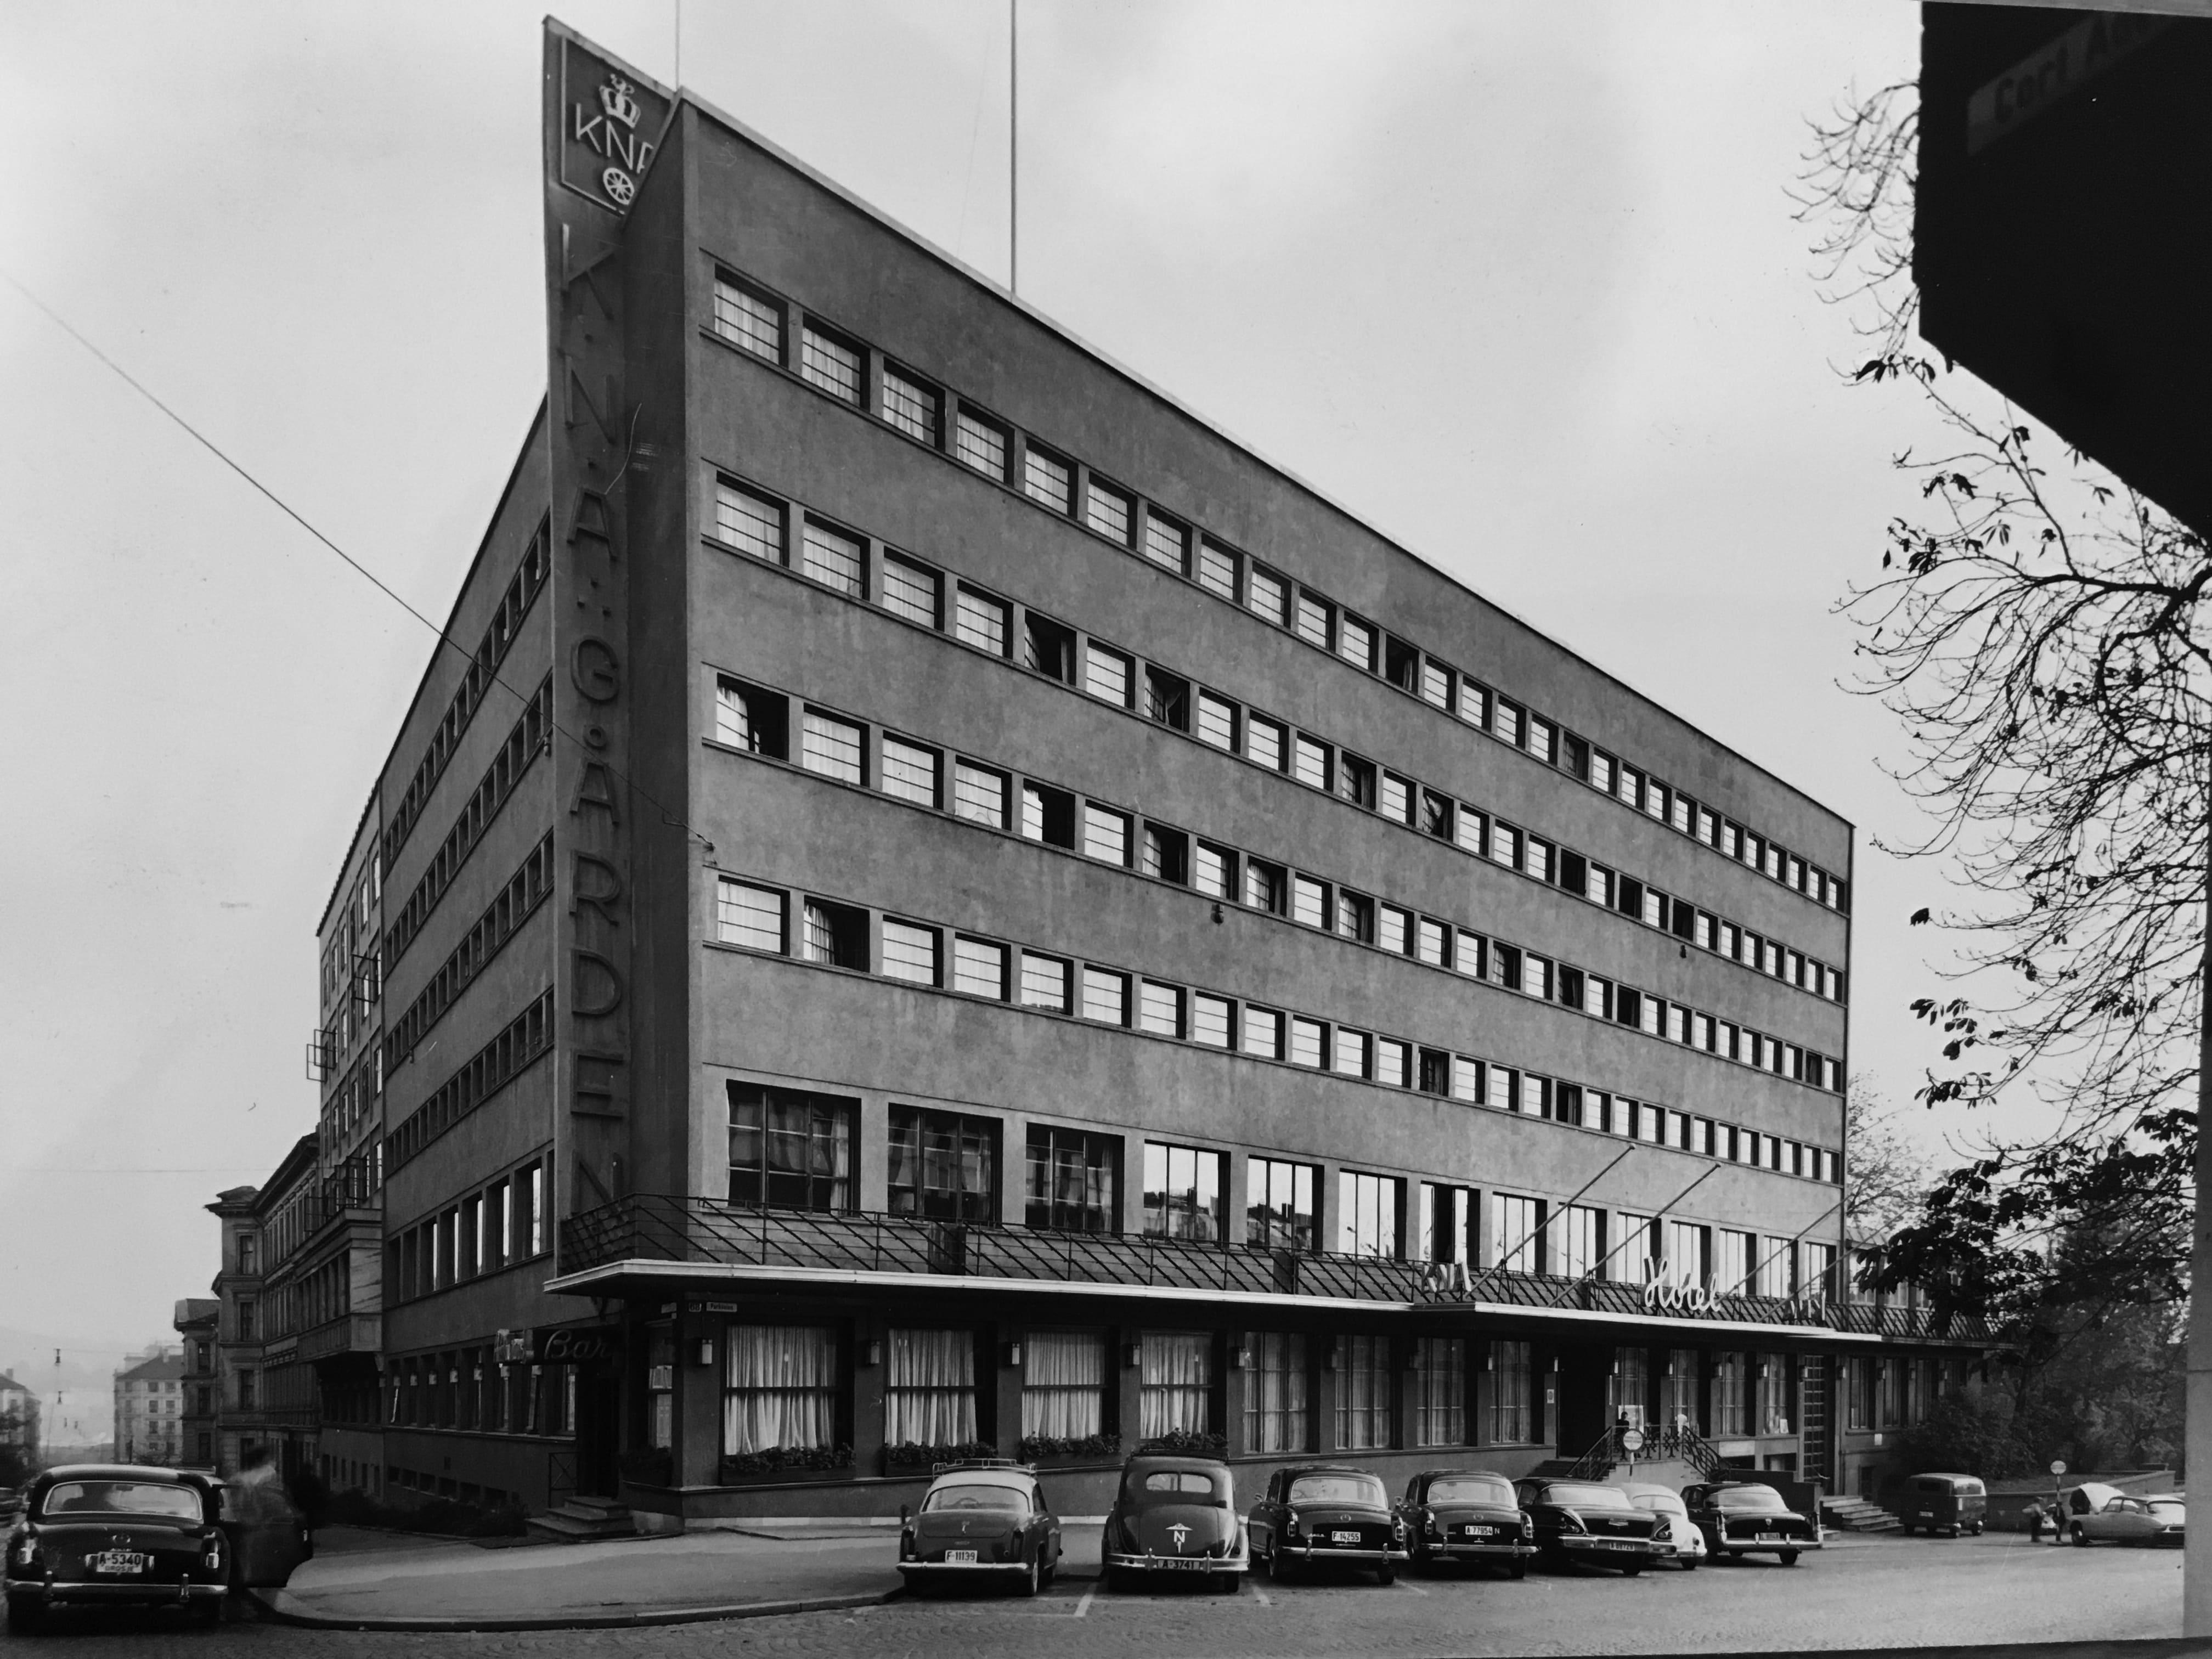 Forretningsgård og hotell for Kongelig Norsk Automobilklub.